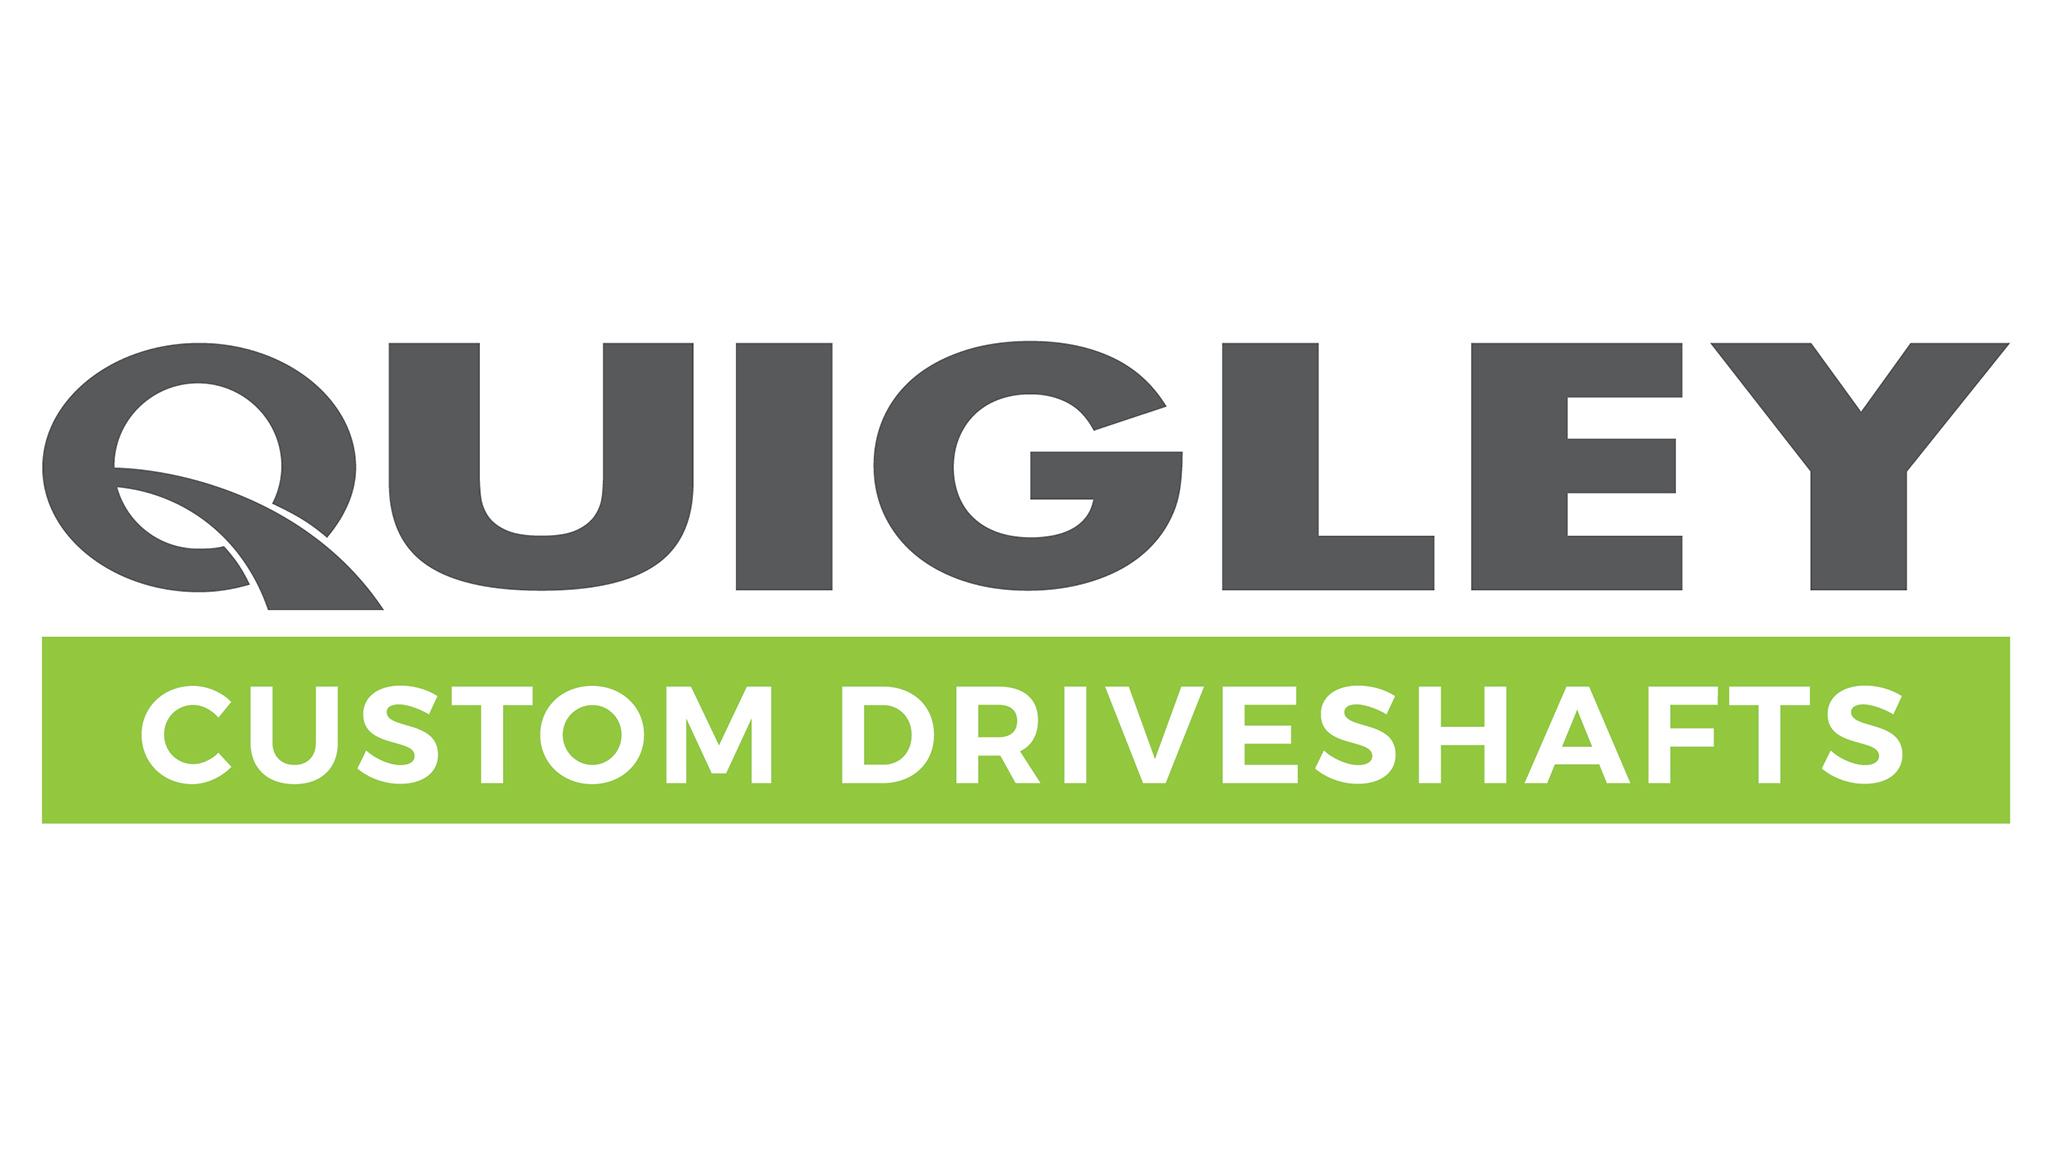 Official Custom Driveshaft